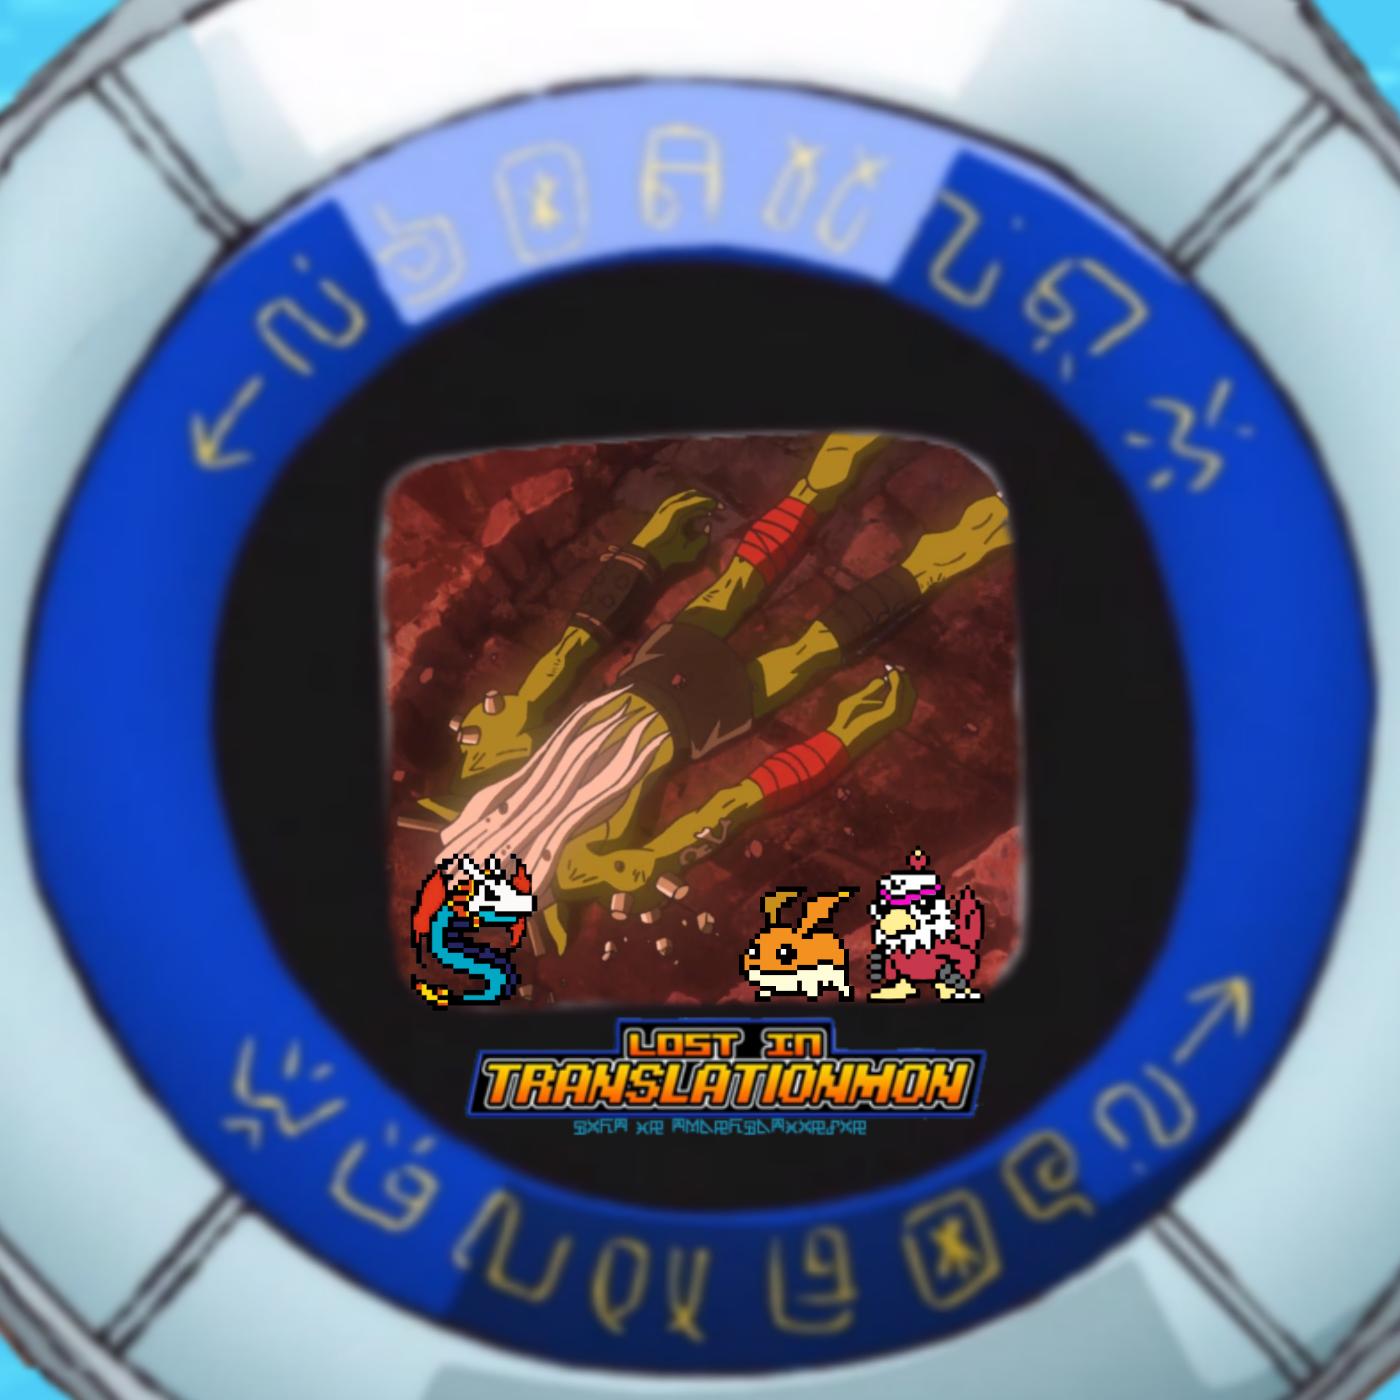 Digimon Adventure 2020 Episode 9 Podcast Discussion